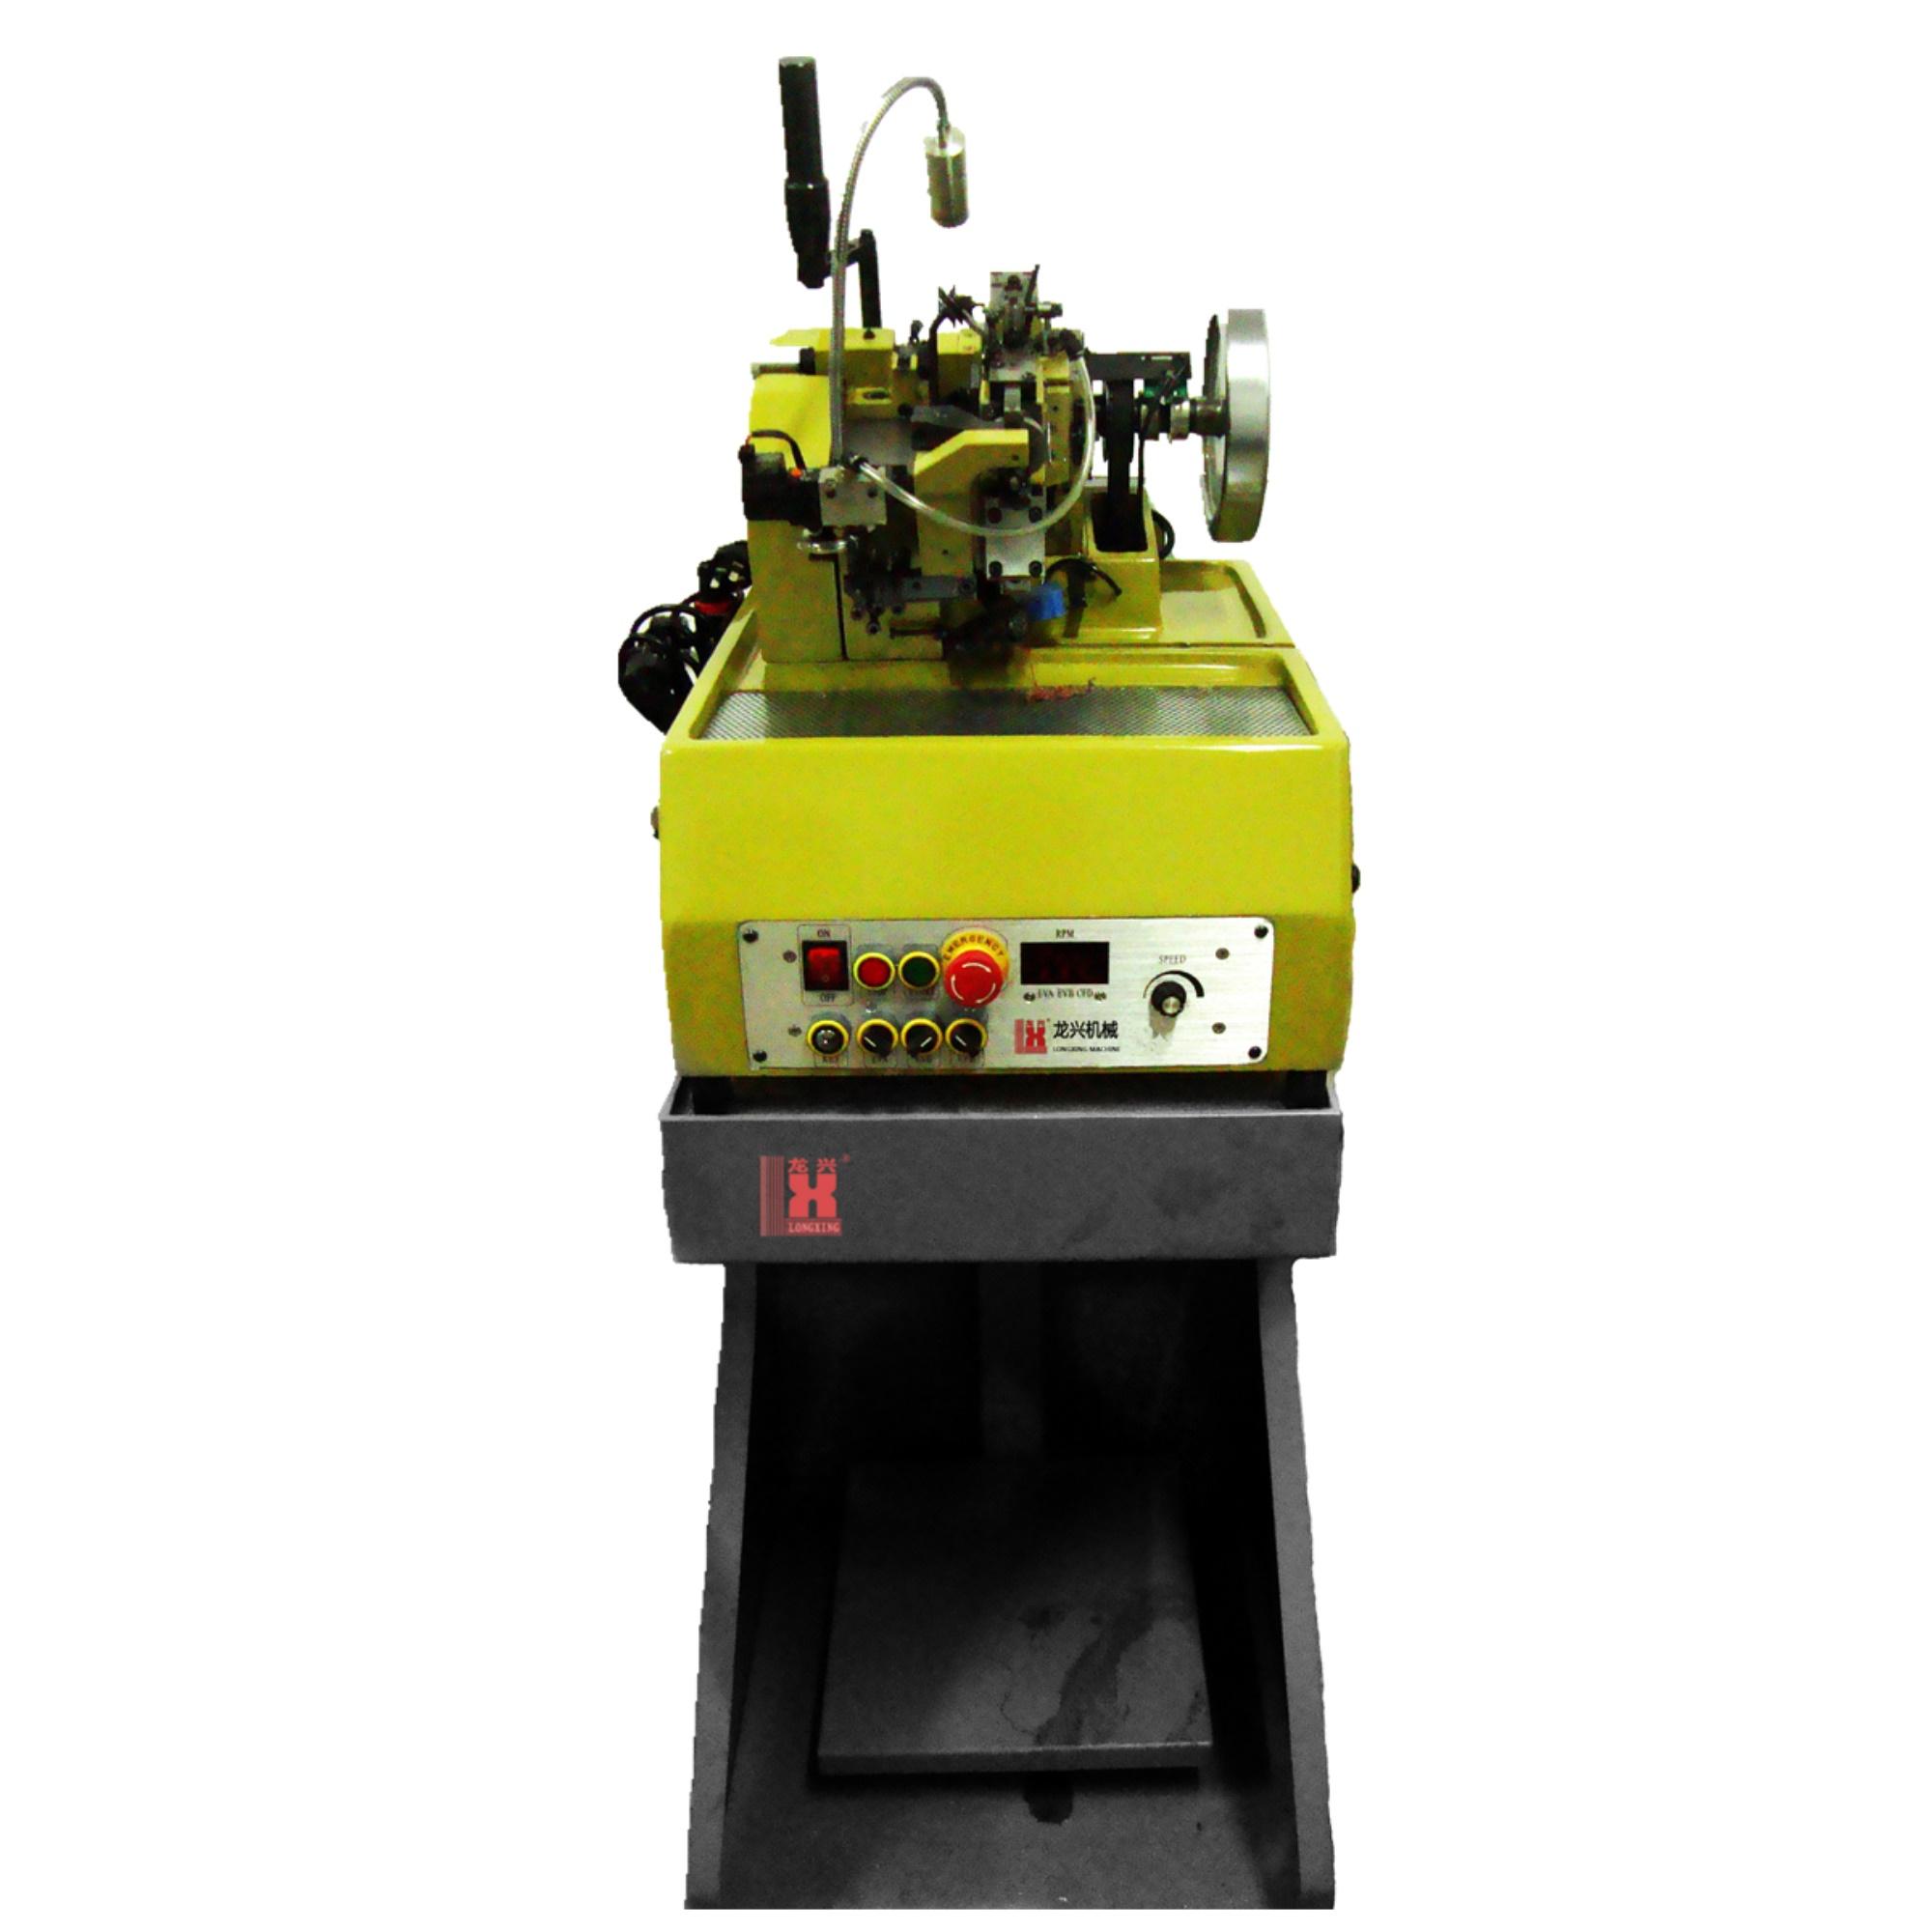 LX1009 激光焊接高速织链机